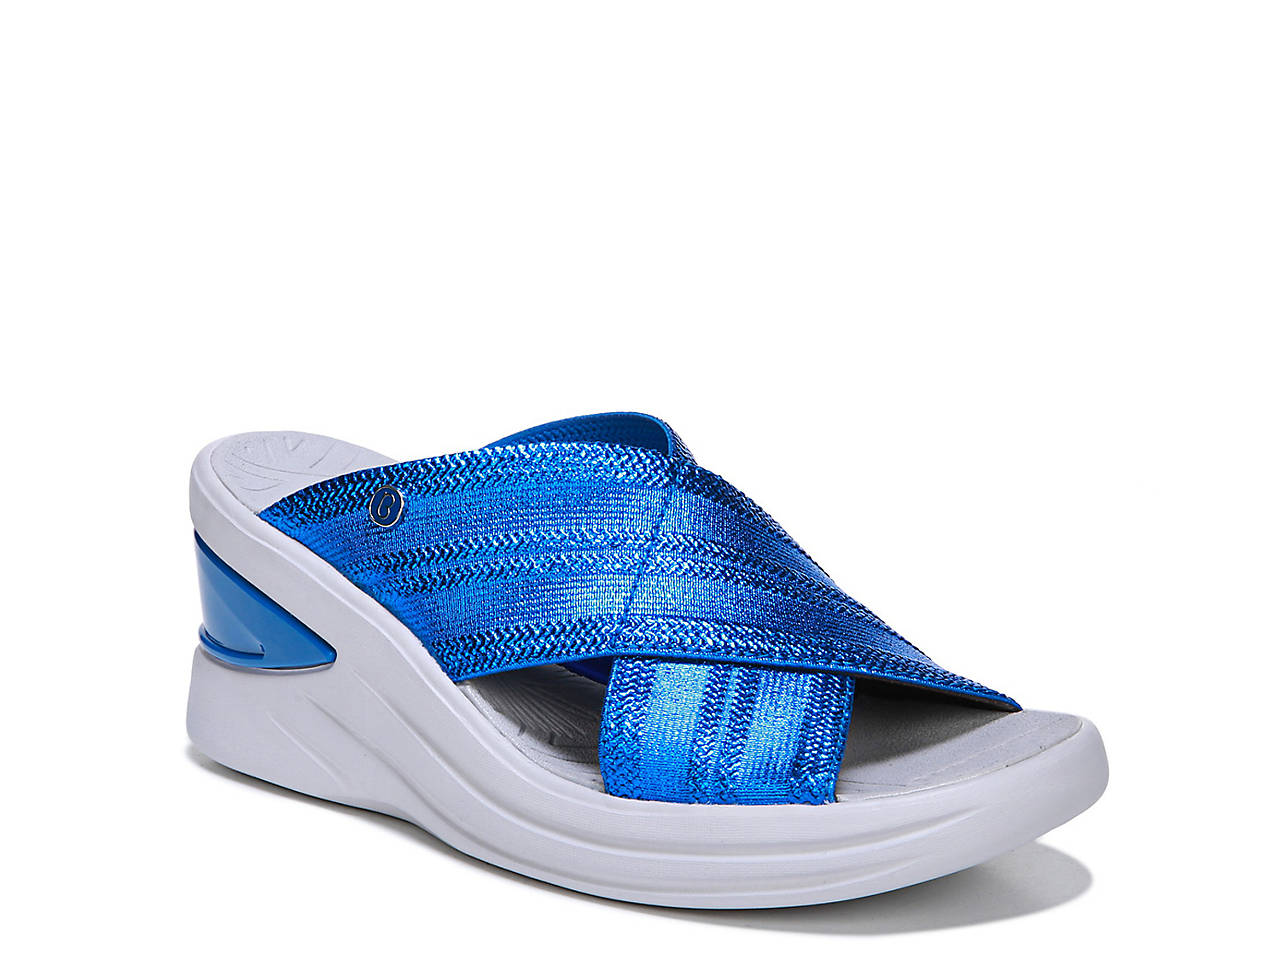 b65e1e25bc4b BZees Vista Wedge Sandal Women s Shoes